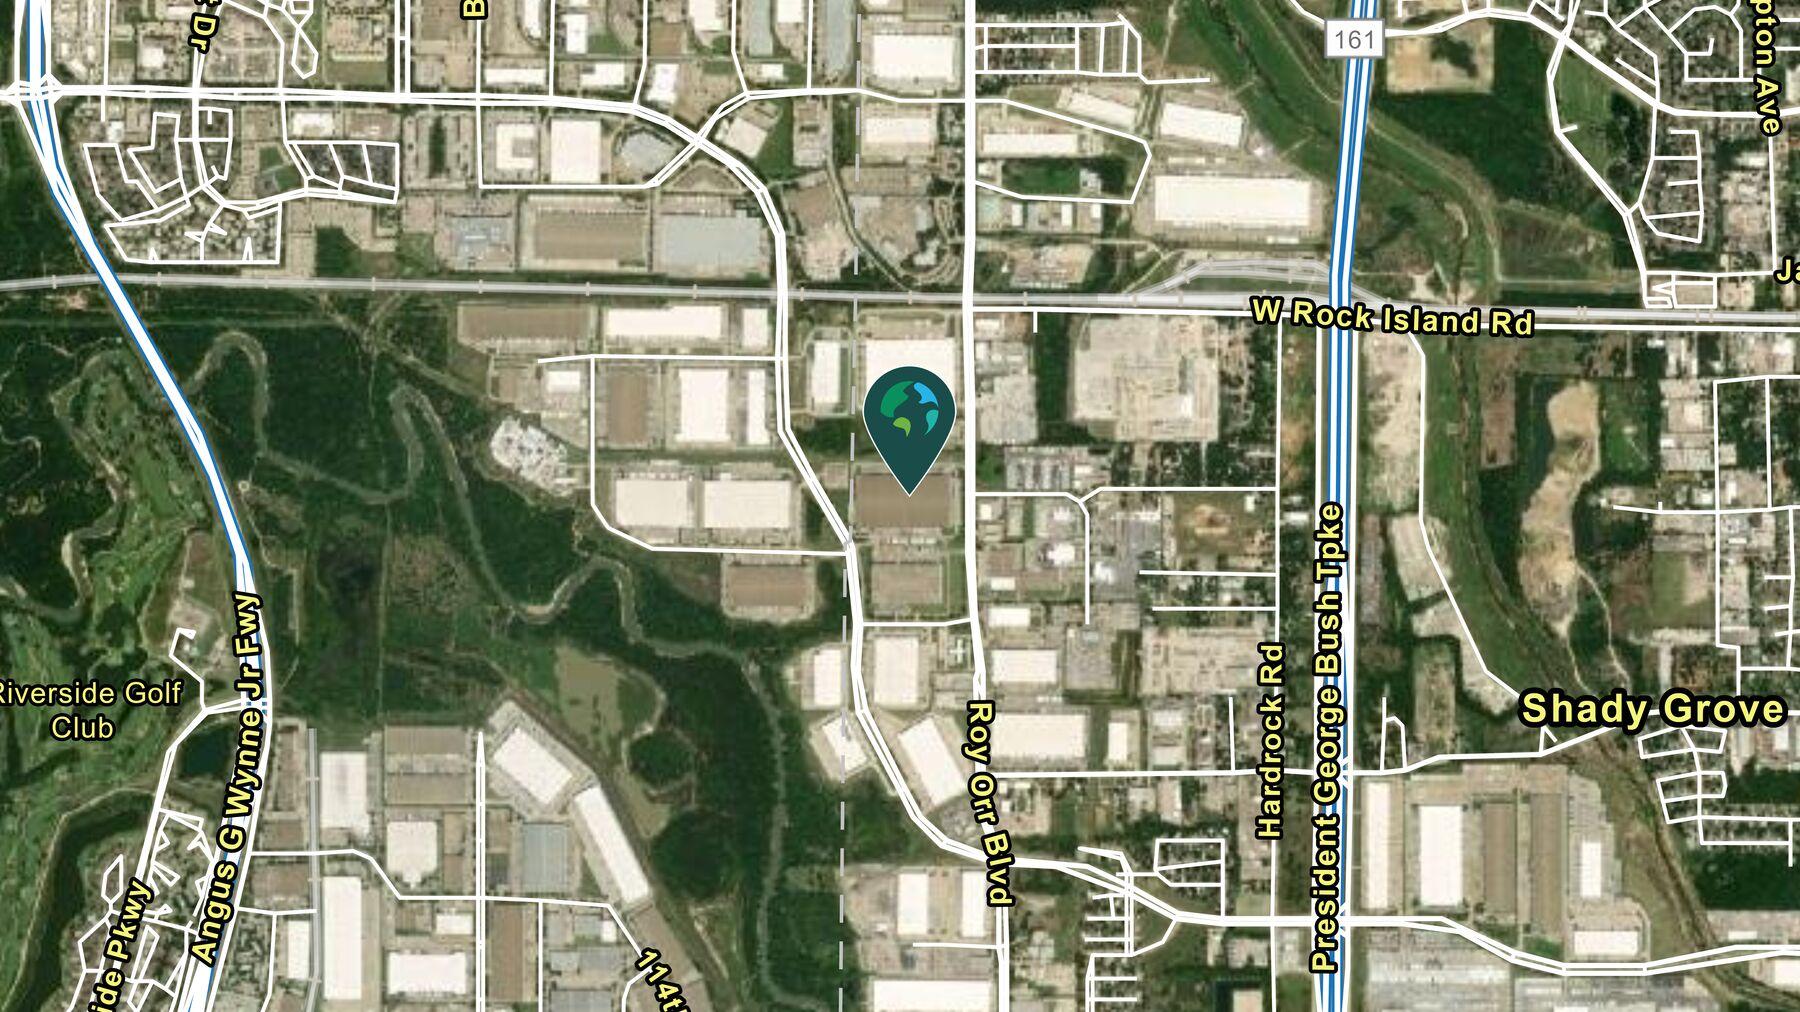 DPM-Prologis-Great-Southwest-45-DAL01745-3450-Roy-Orr-Blvd_AerialMap.jpg